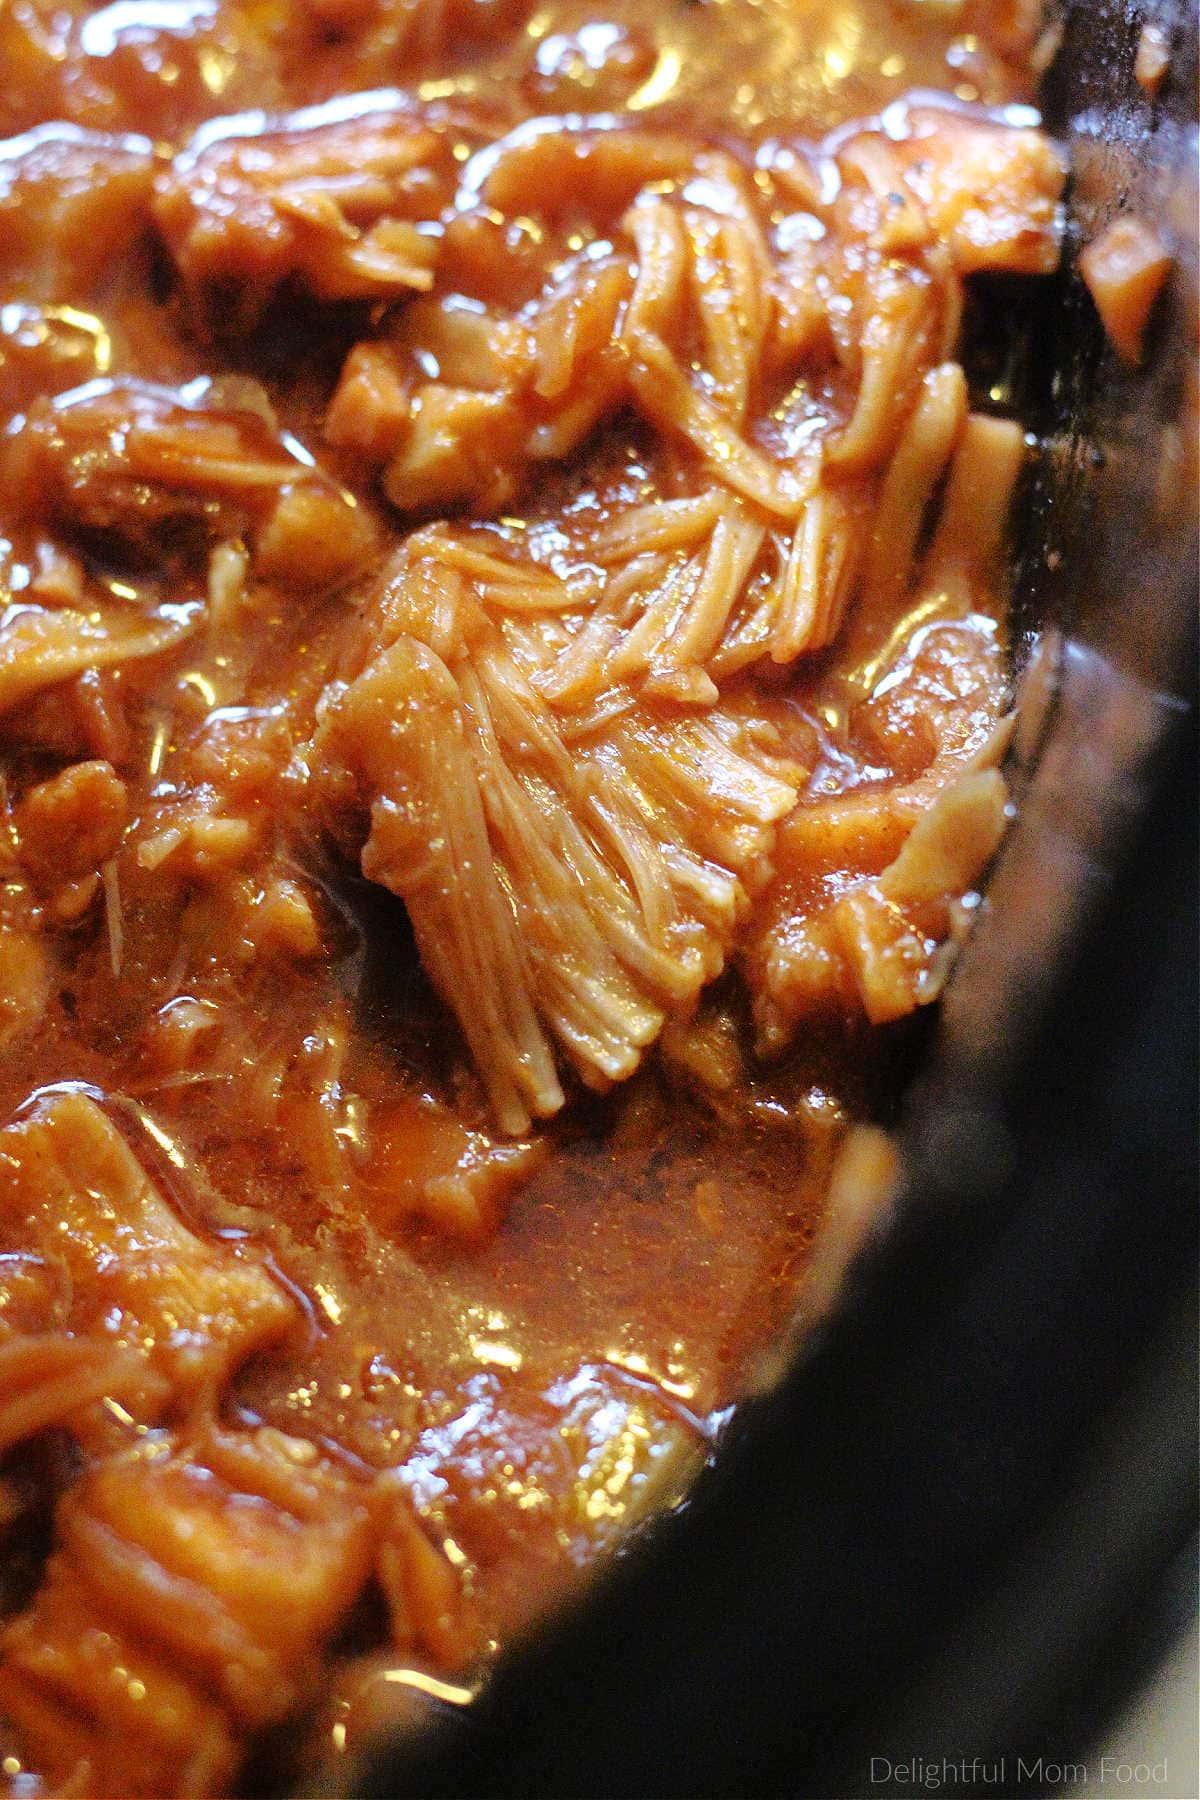 vegan jackfruit pulled pork in the slow cooker